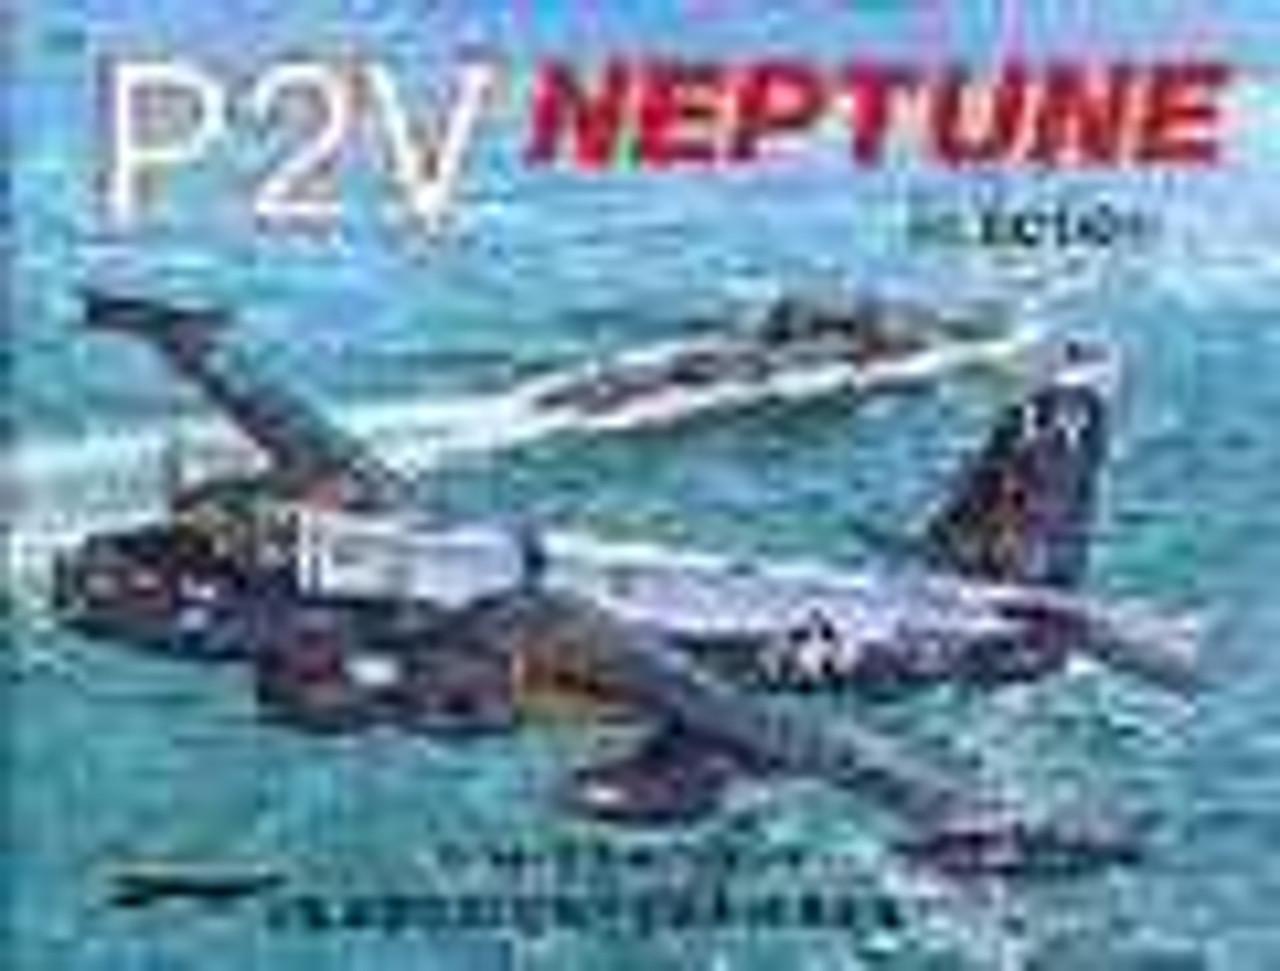 Aircraft Books